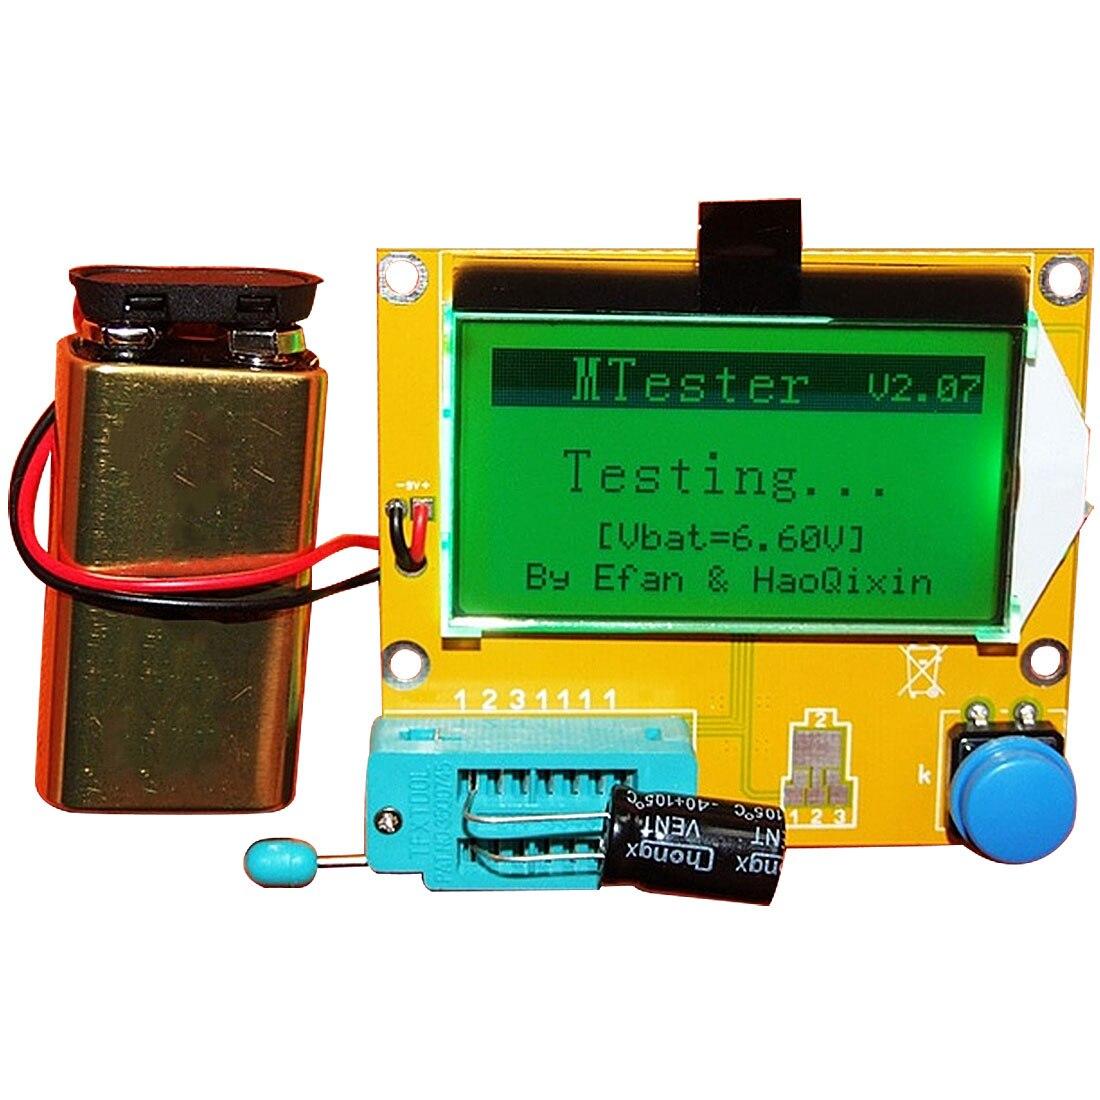 LCR-T4 Mega328 Digitale Transistor Tester Diode Triode Kapazität ESR Meter MOS/PNP/NPN LCR 12864 LCD Bildschirm